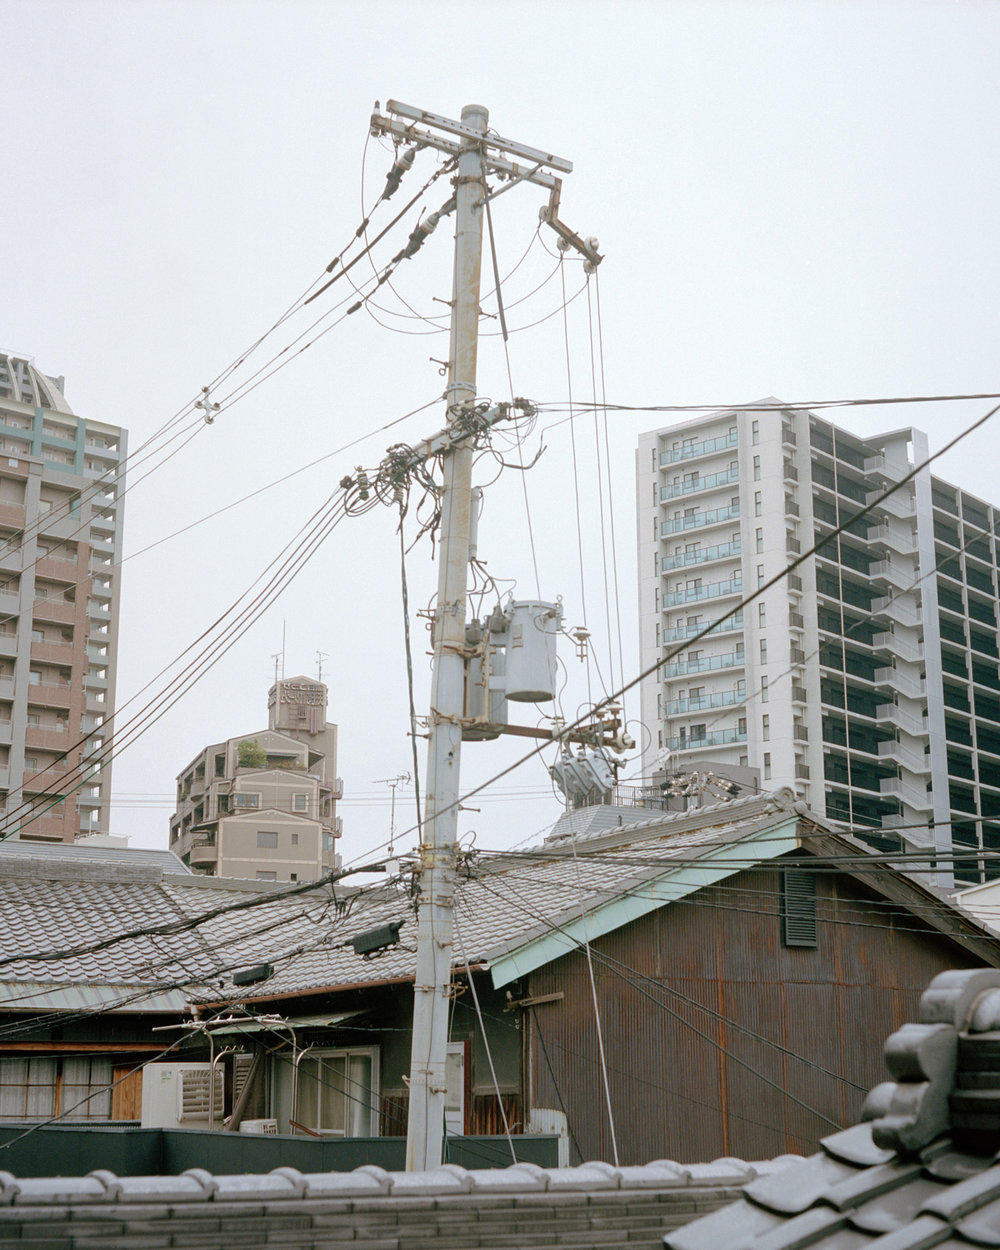 osaka-telephone-pole-0rgb_print_crop_web.jpg